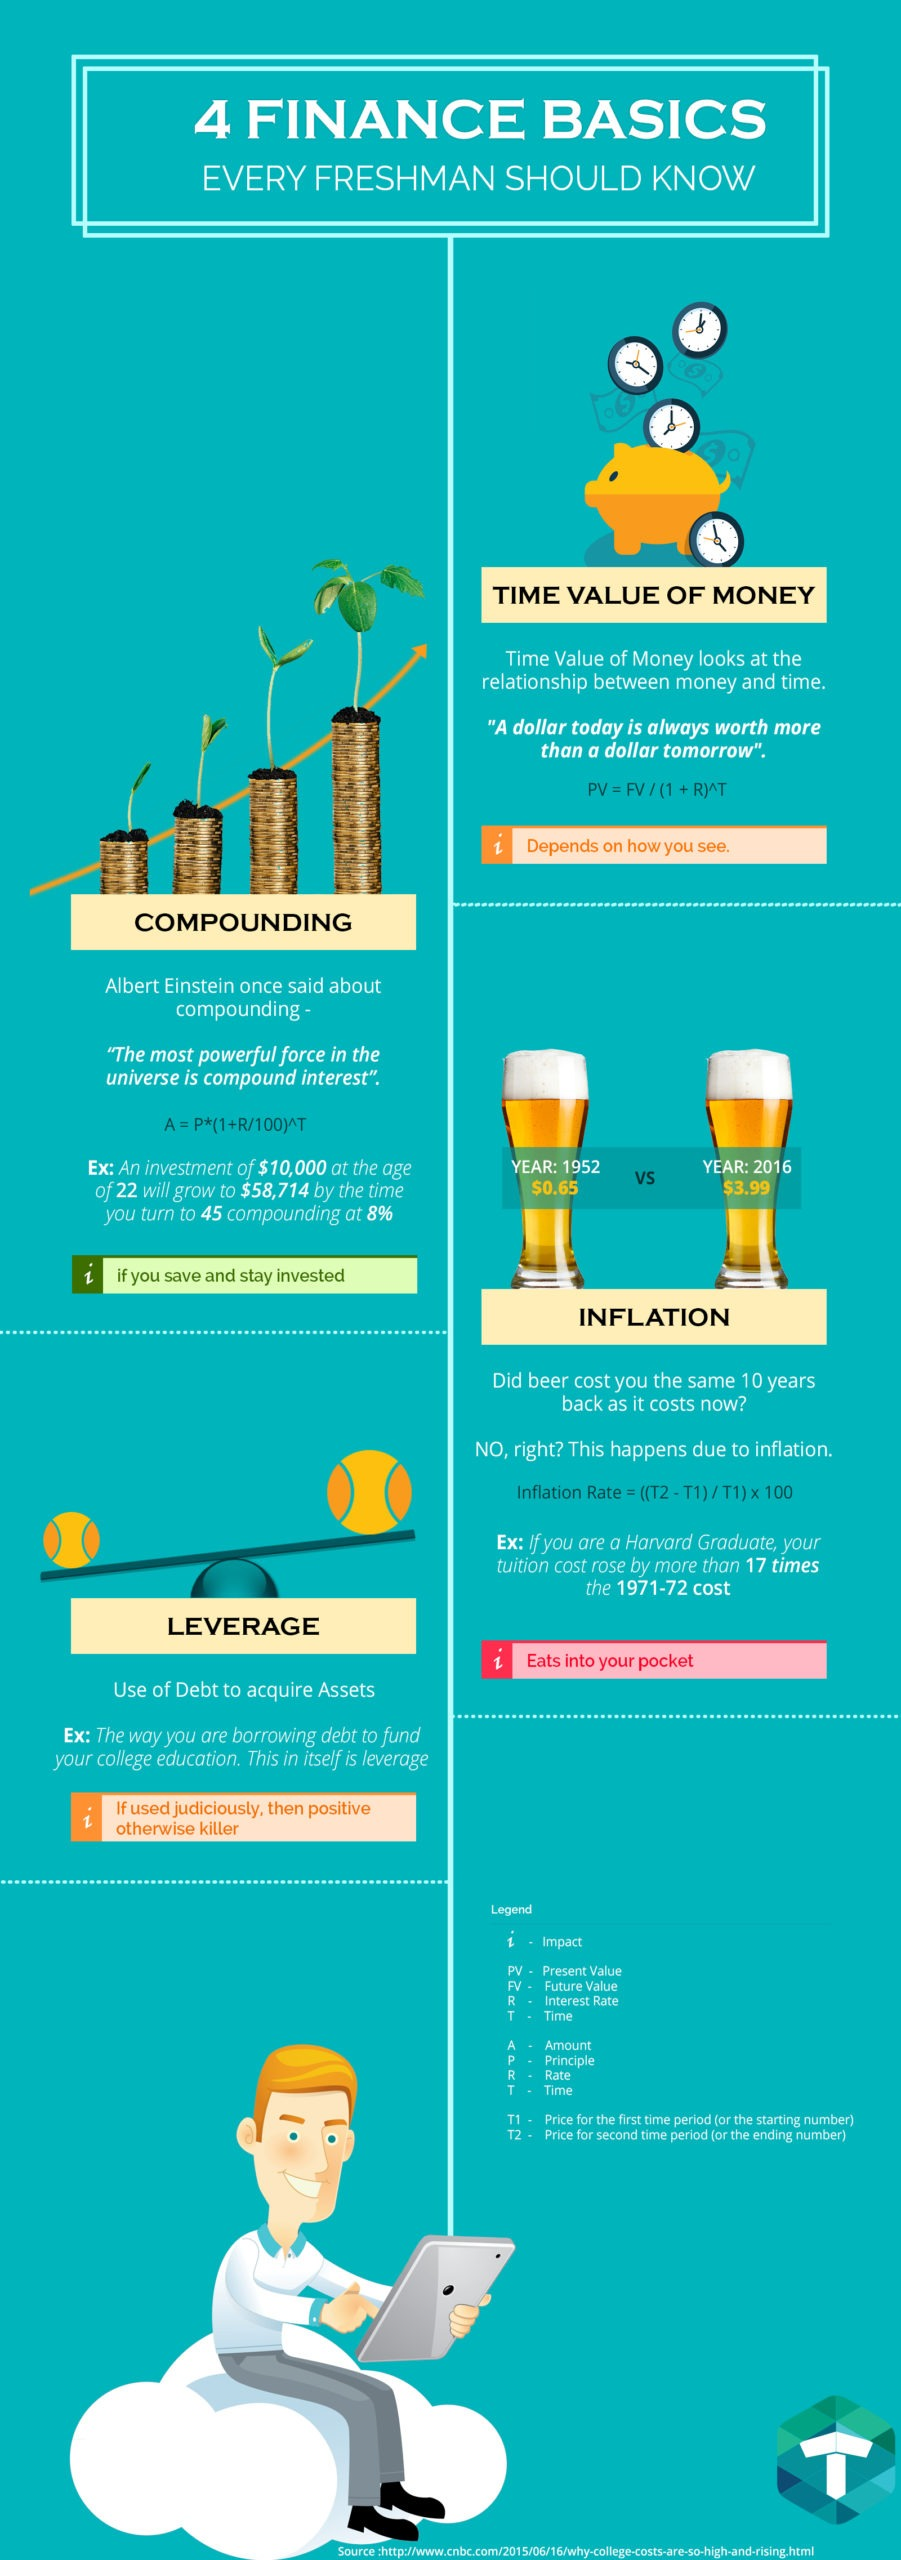 4 basics of finance, every freshmen should know